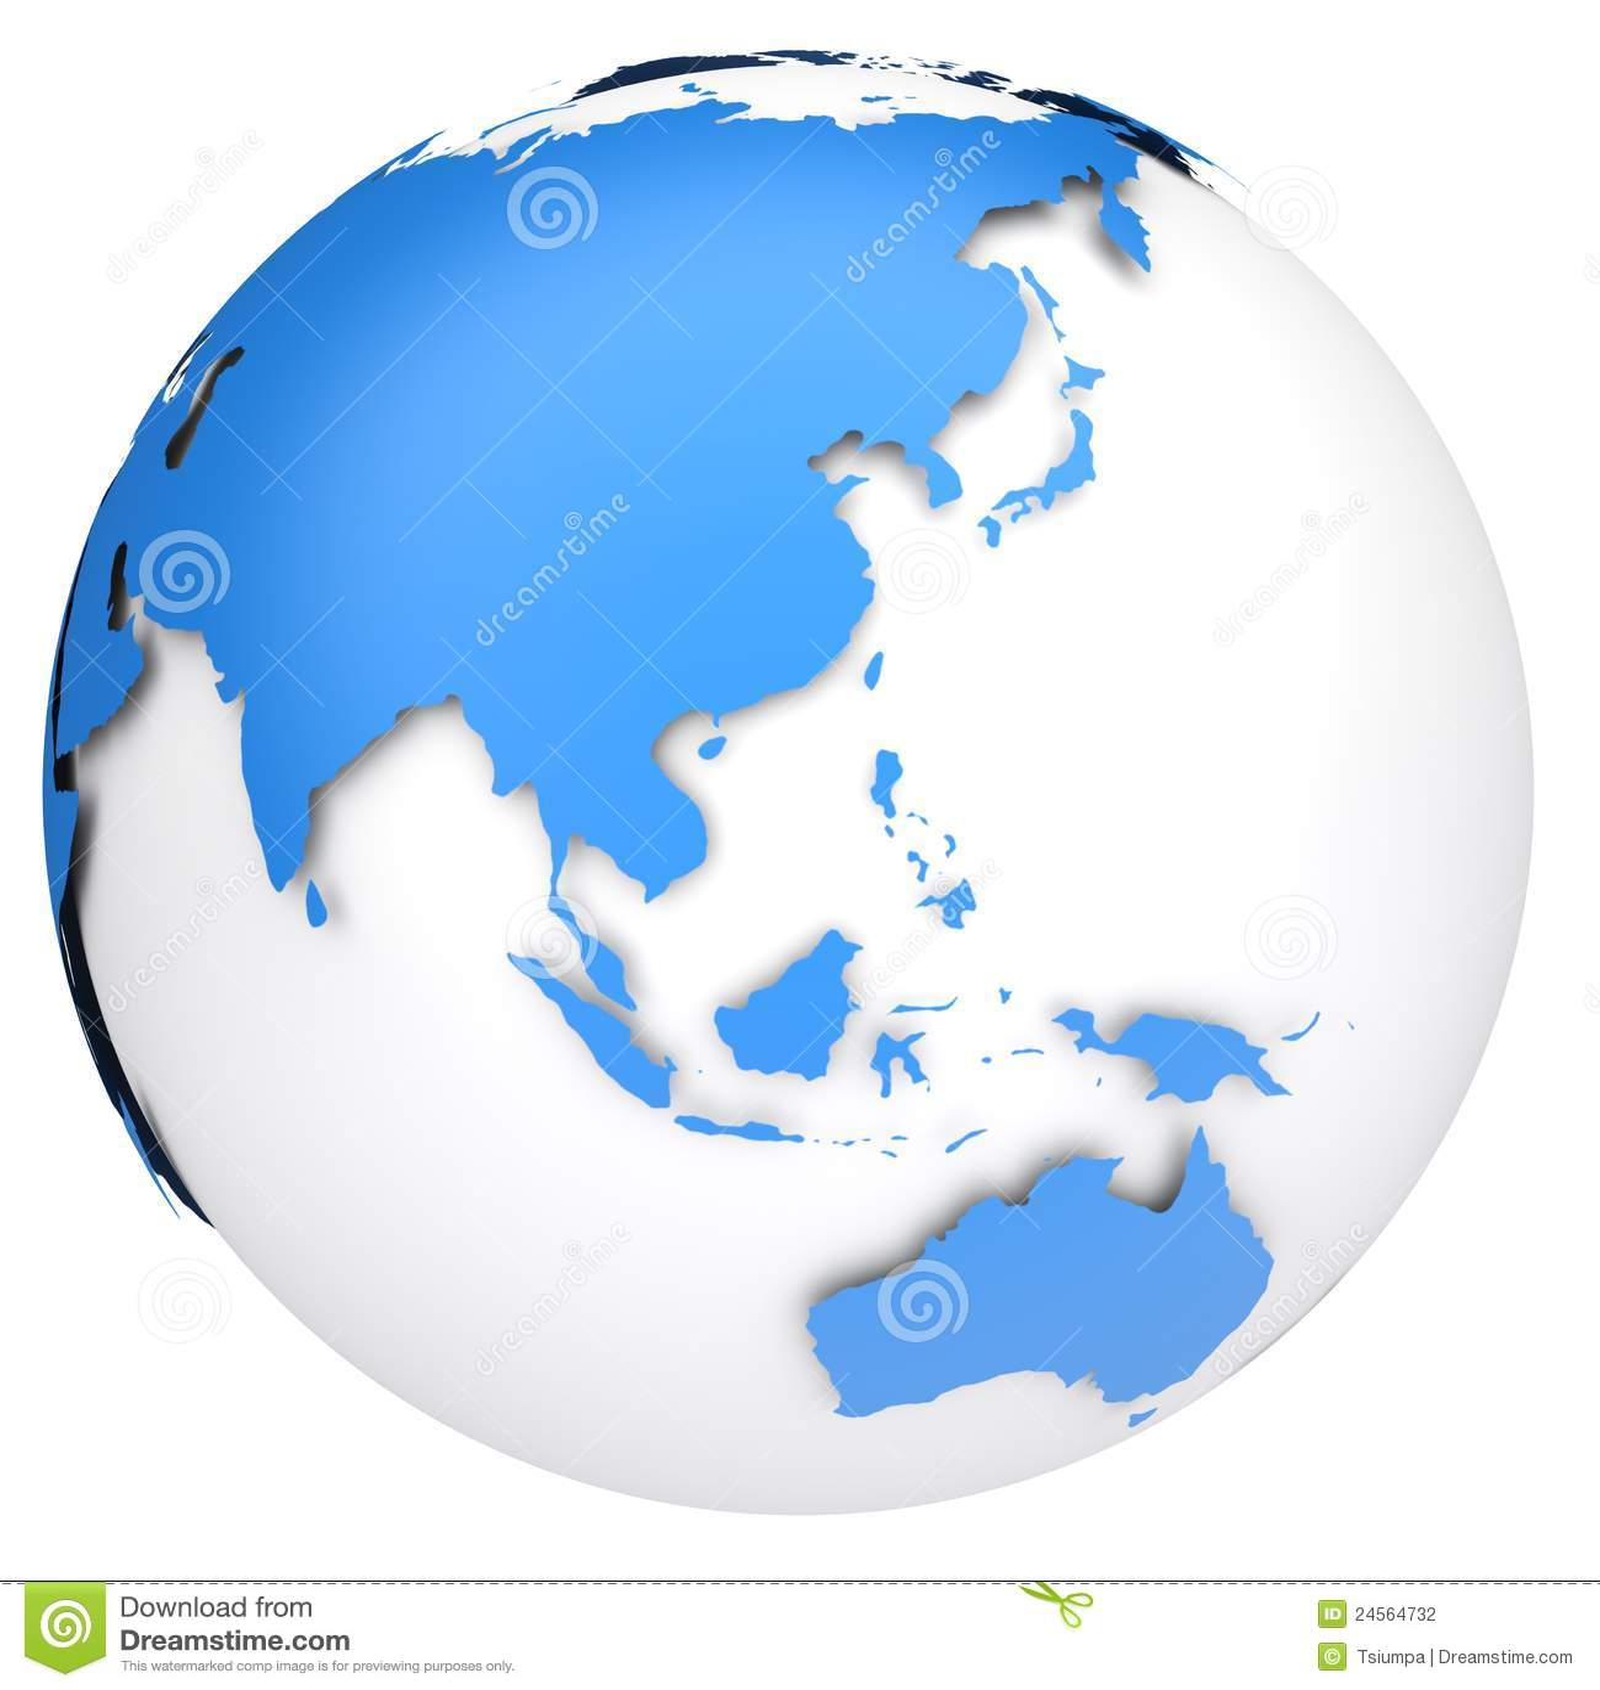 Kula ziemska ziemski model